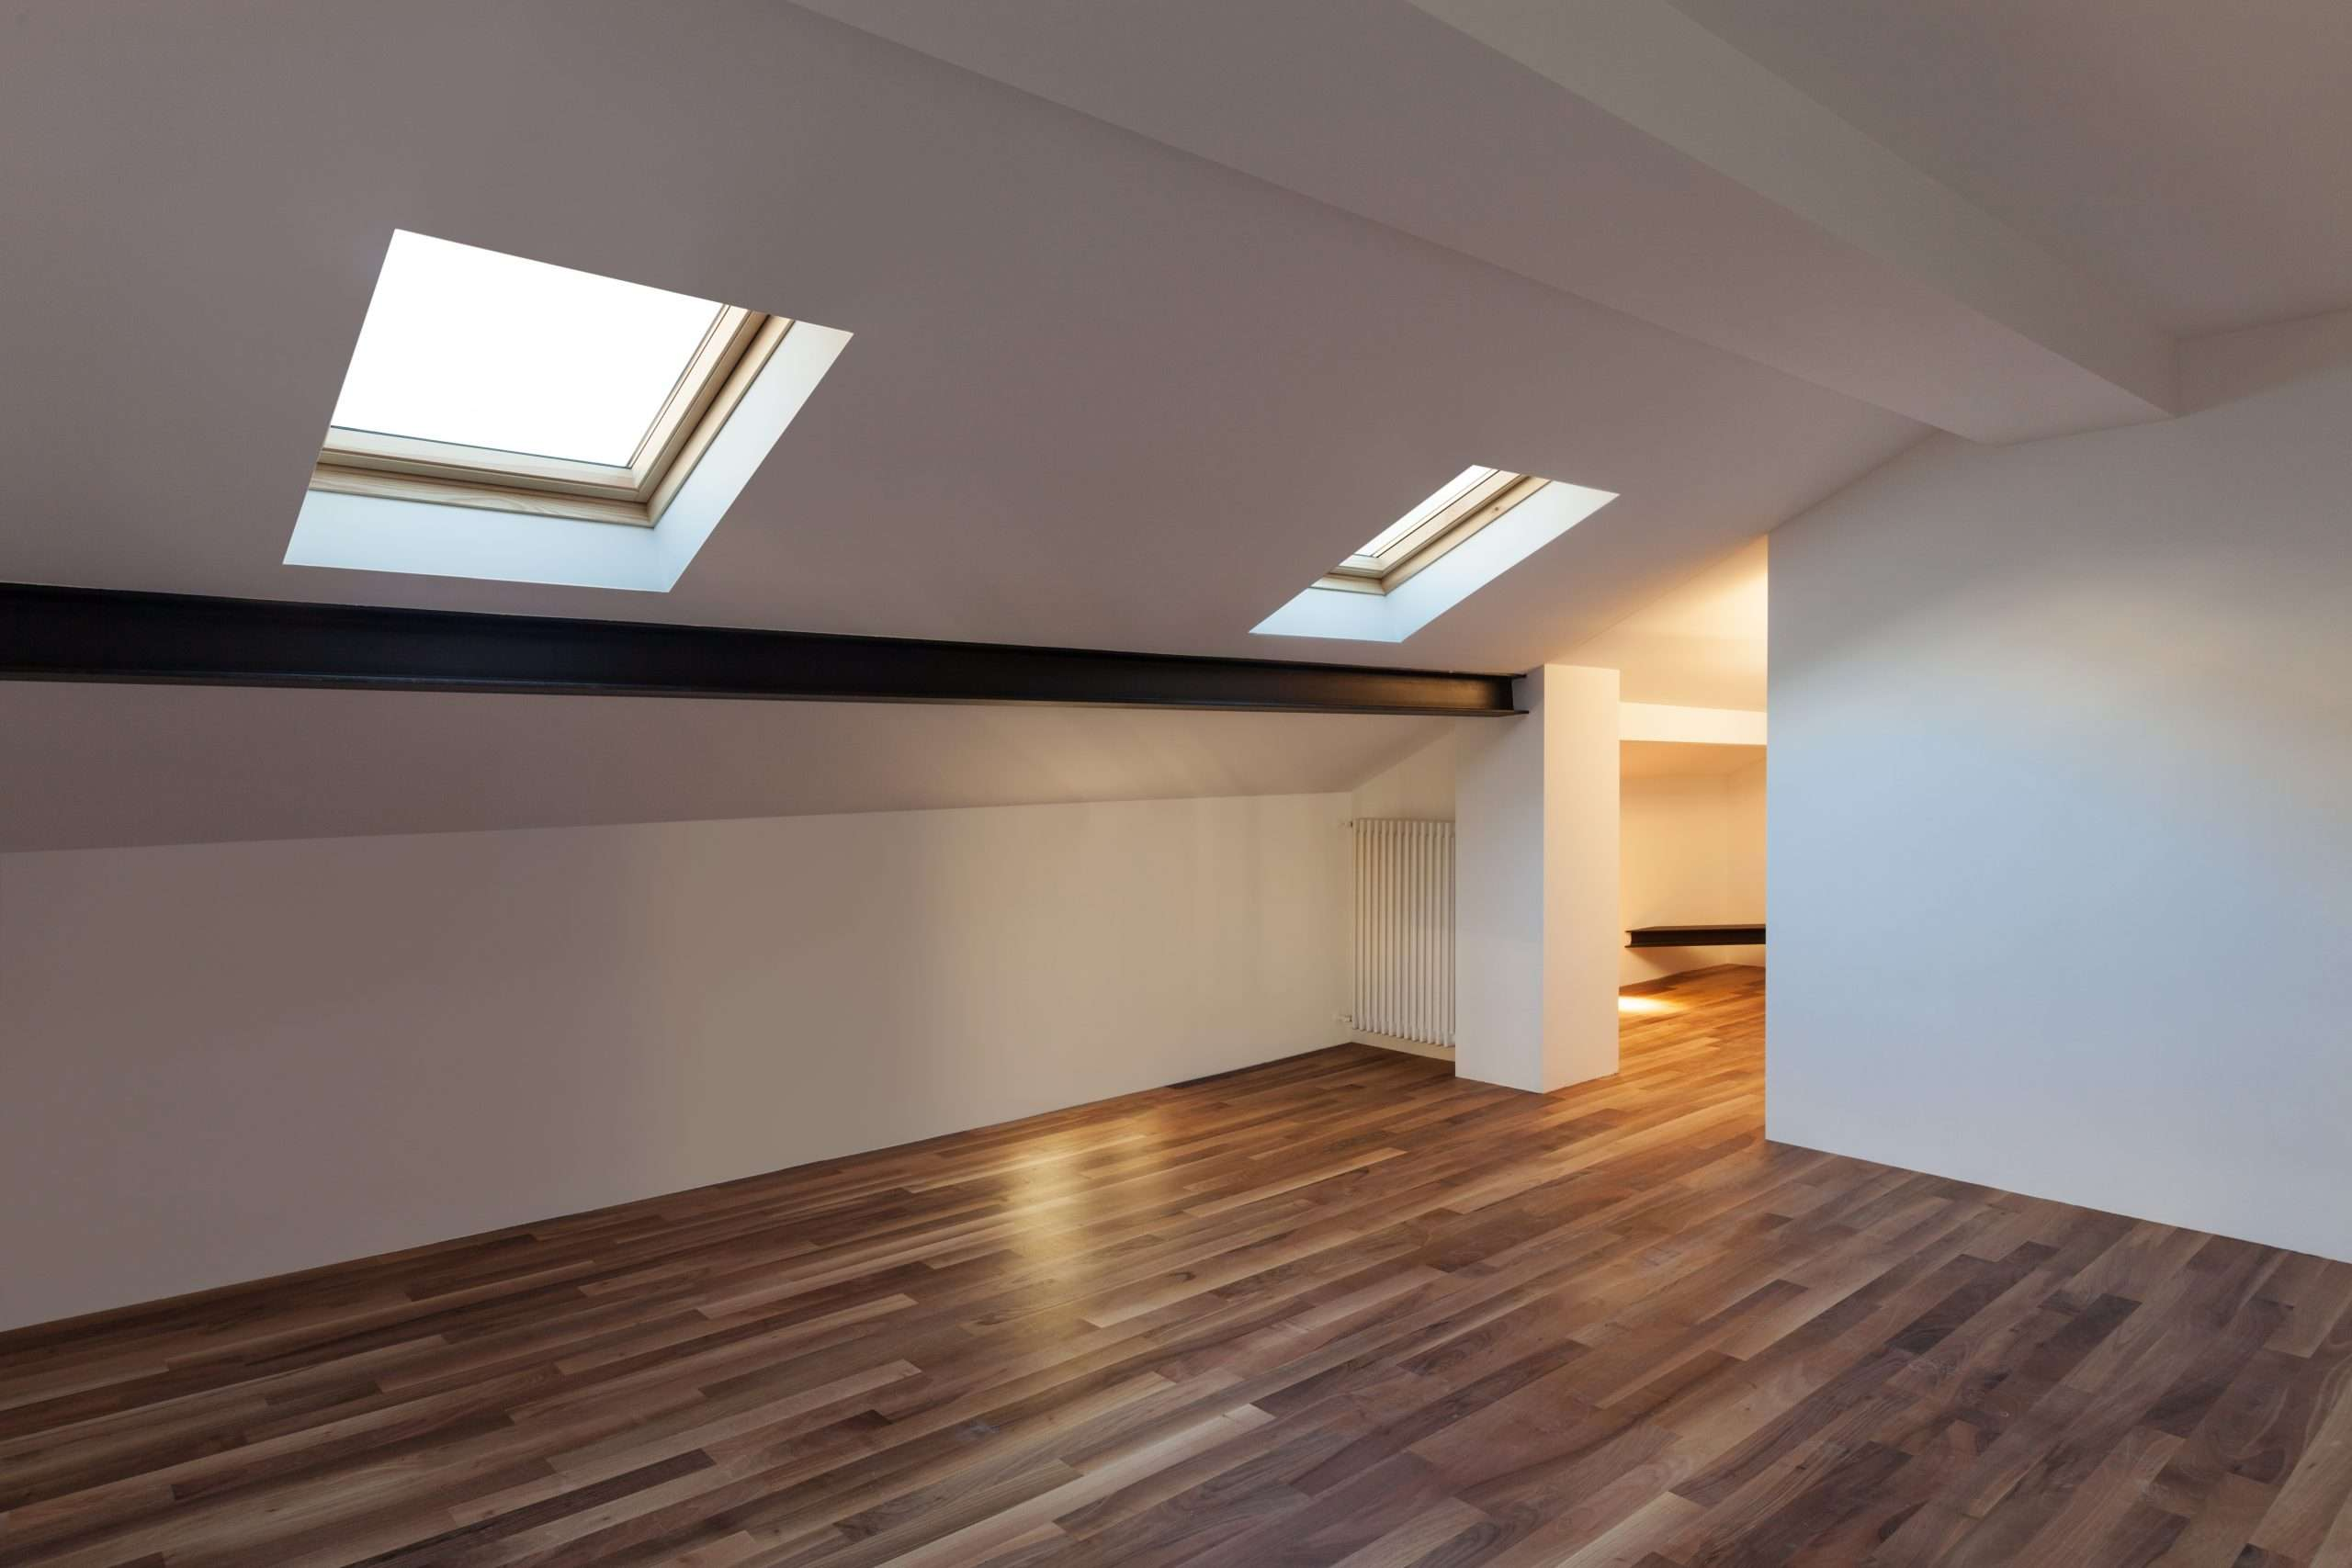 Interior of developed loft